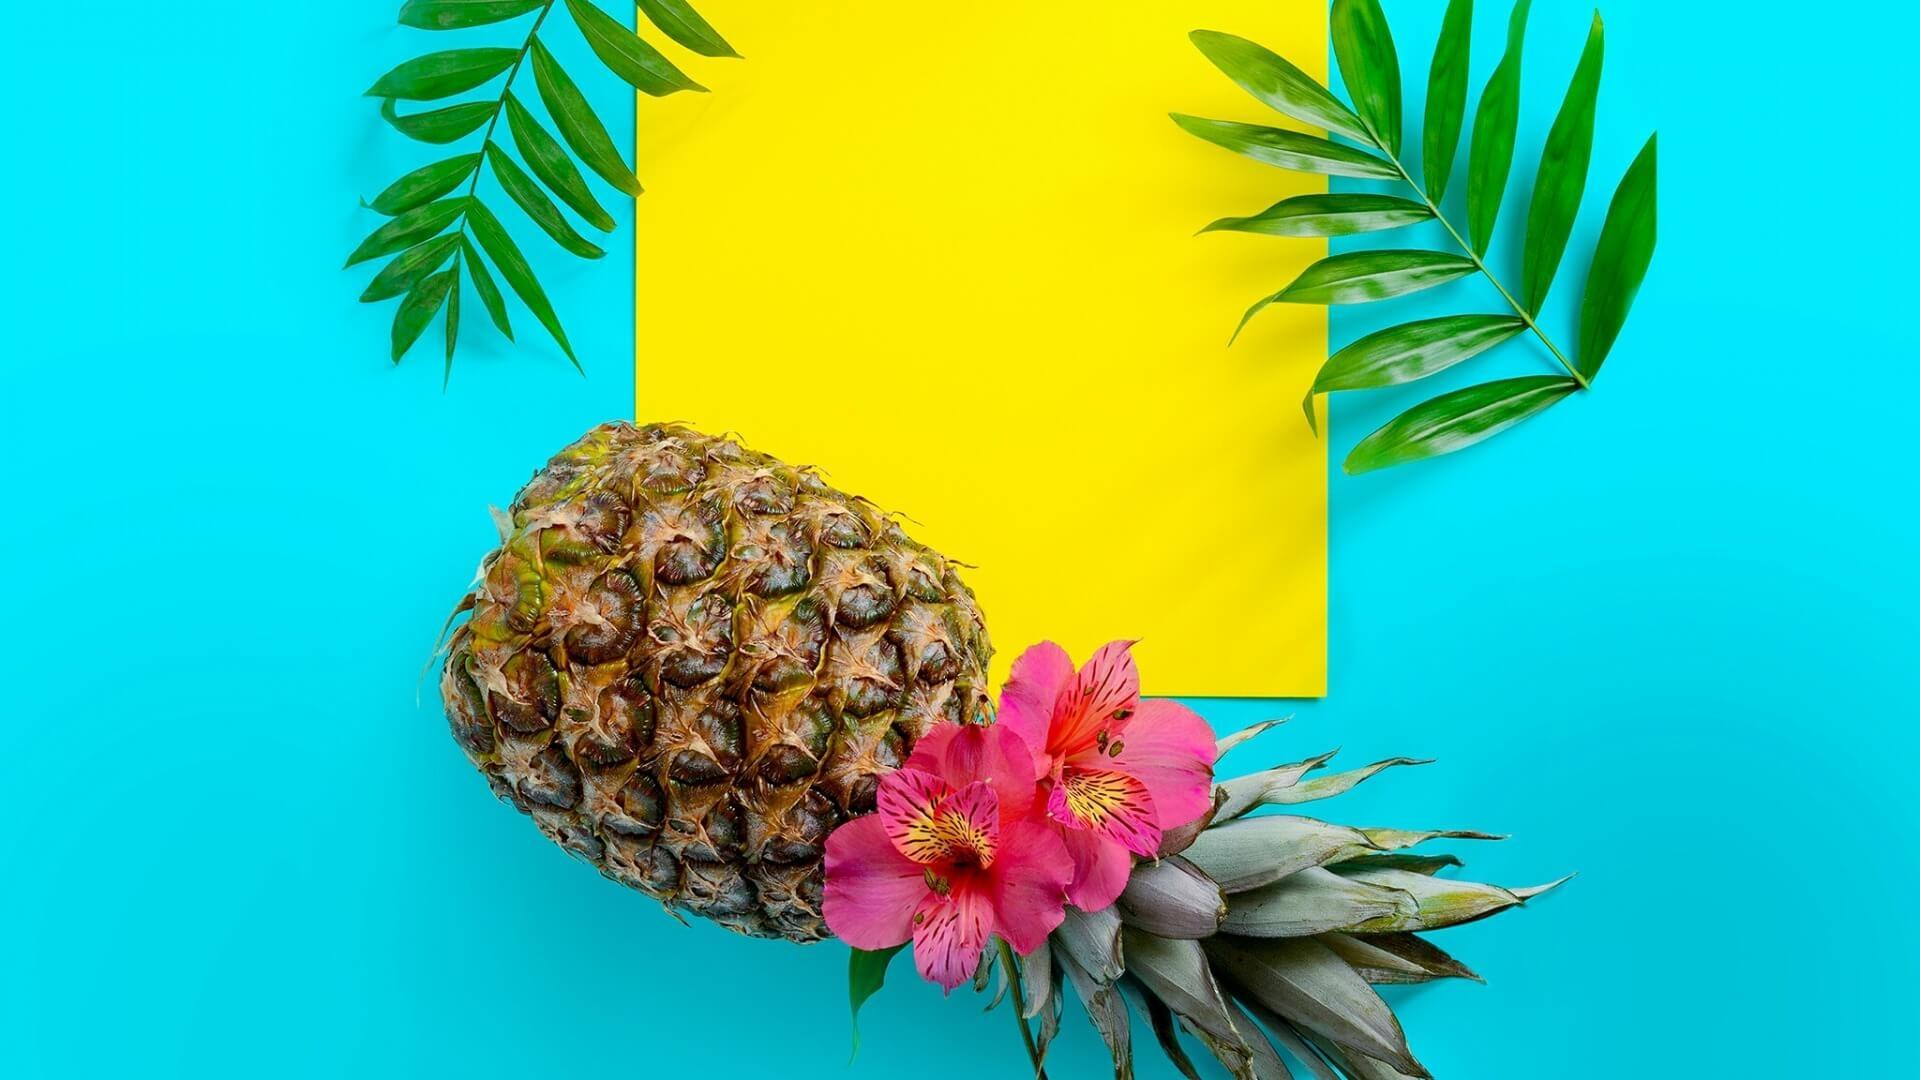 Обои на рабочий стол ананас на голубом фоне